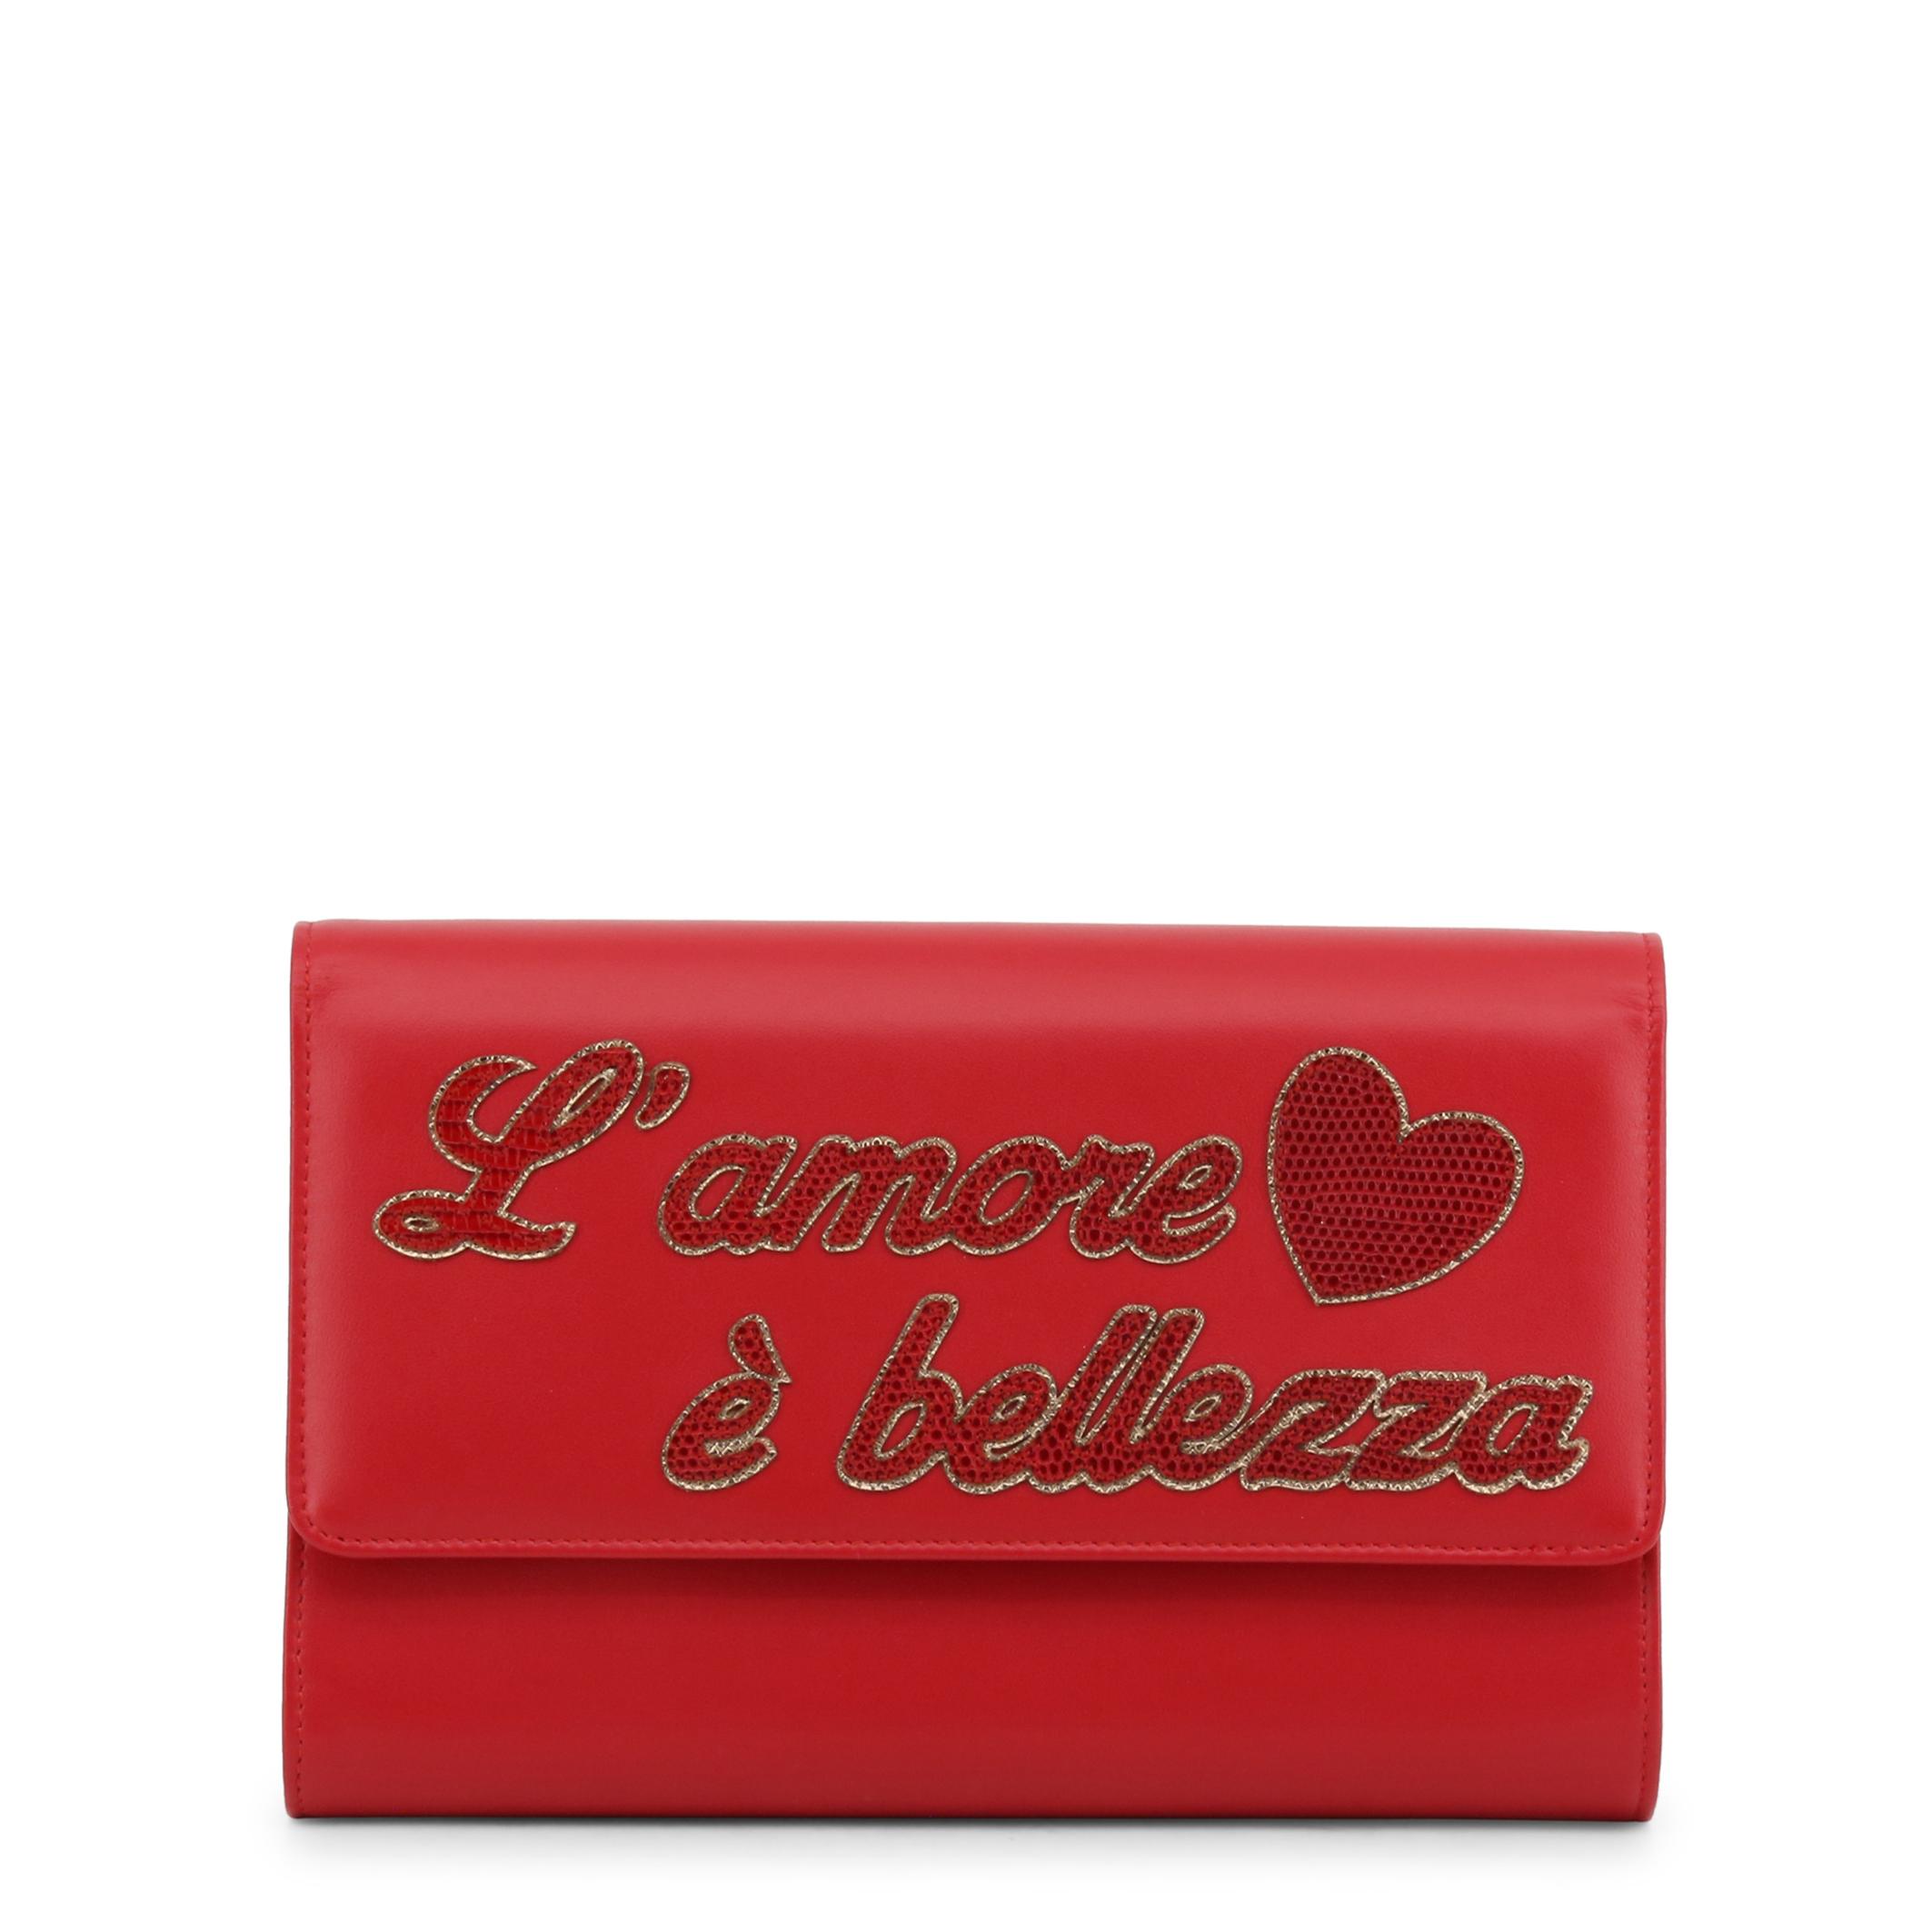 Dolce et Gabbana BI1100AU2848